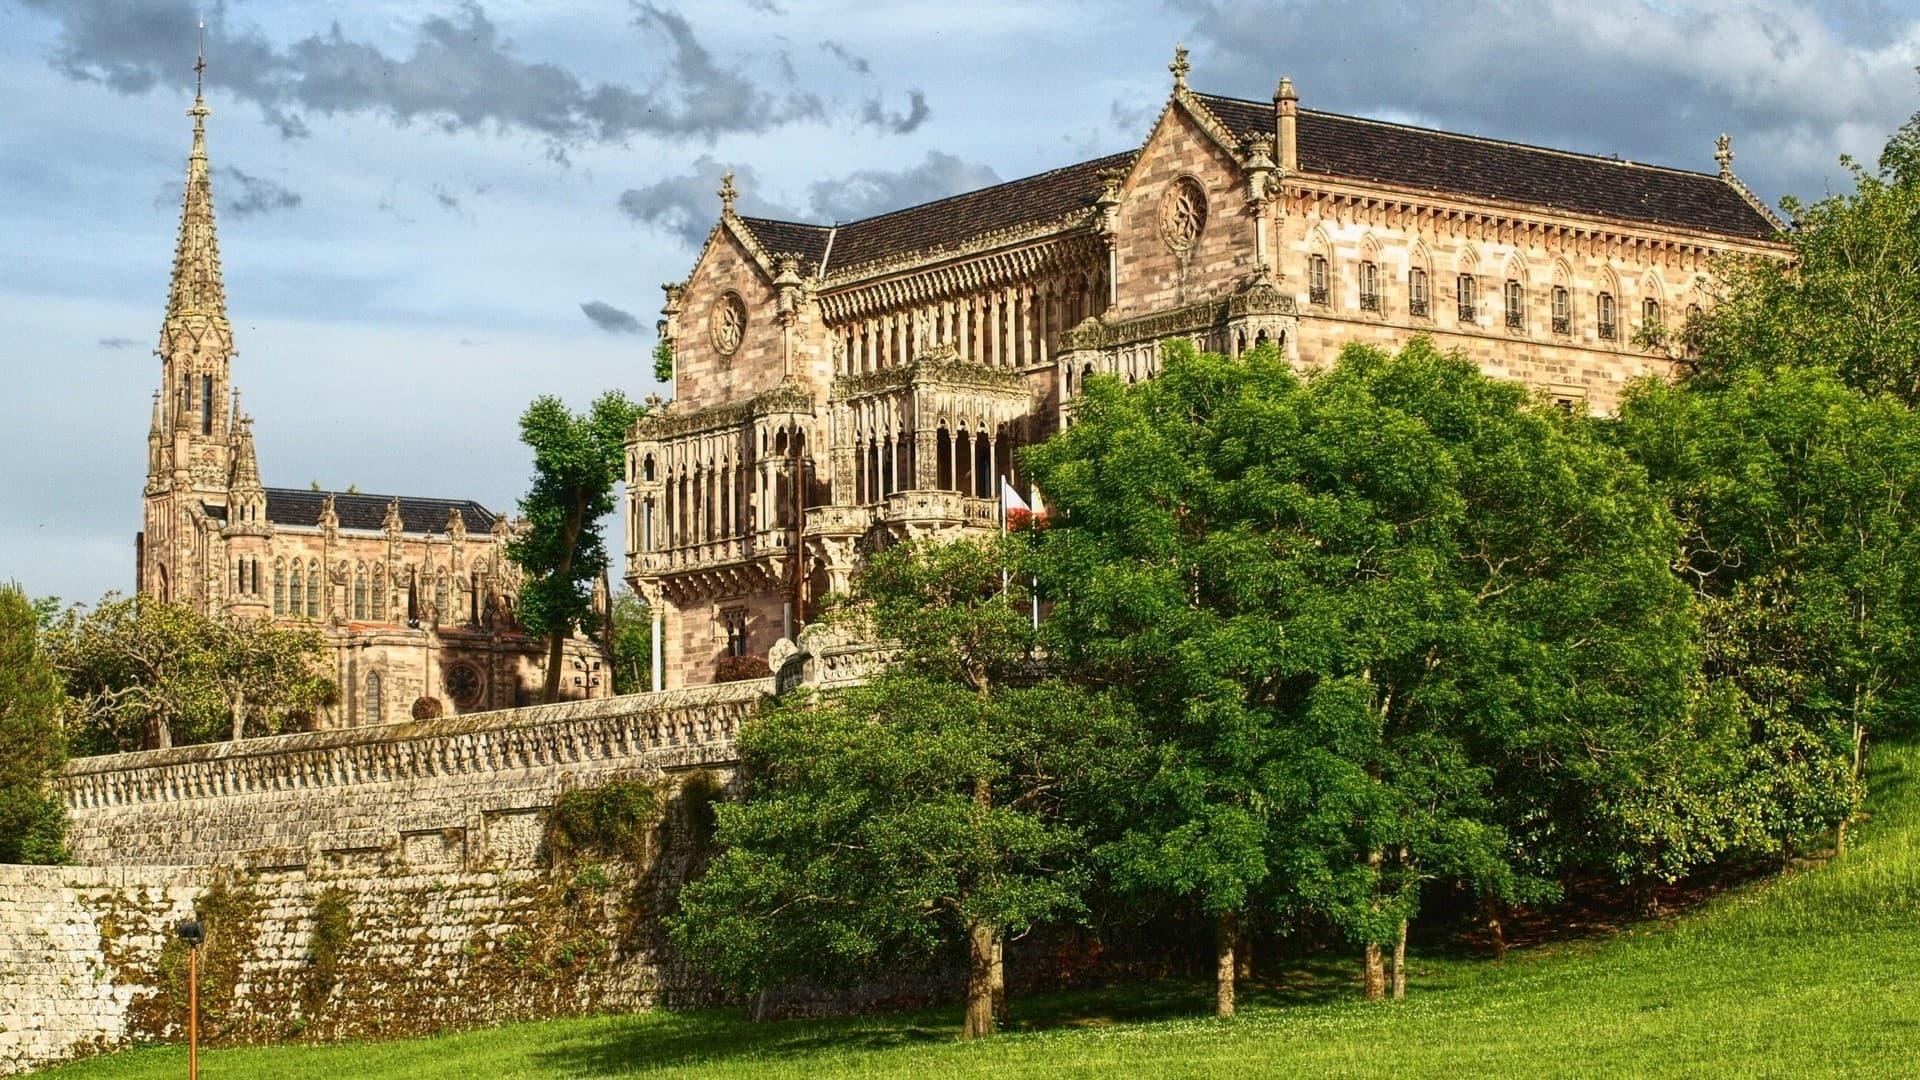 Дворец Sobrellano, Кантабрия, Испания